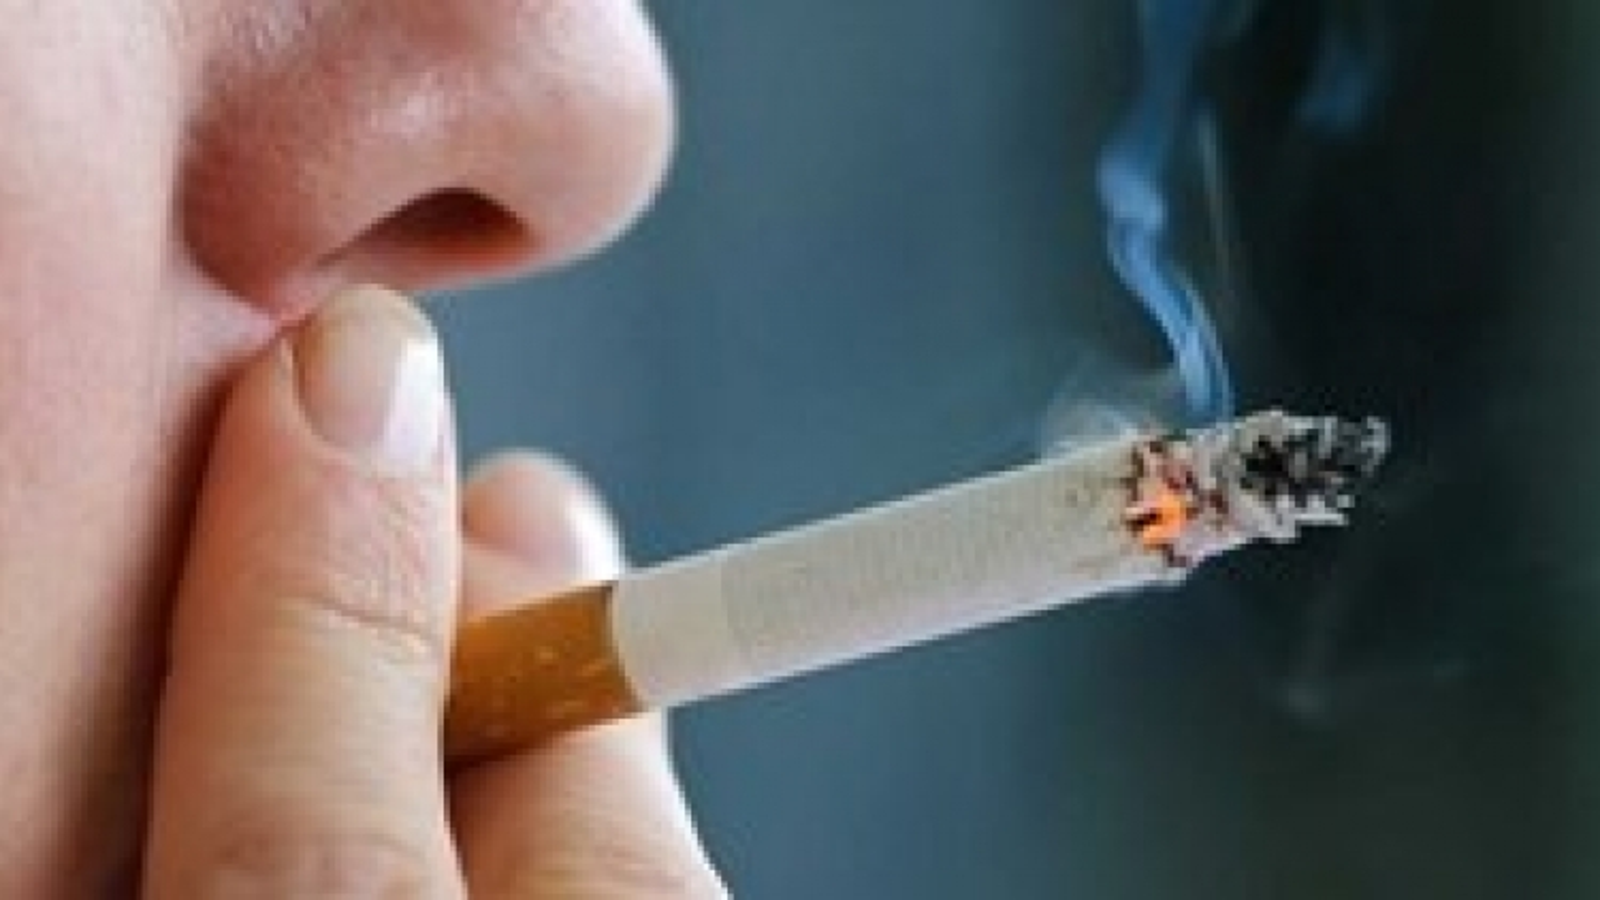 Smuggled cigarettes a serious health hazard